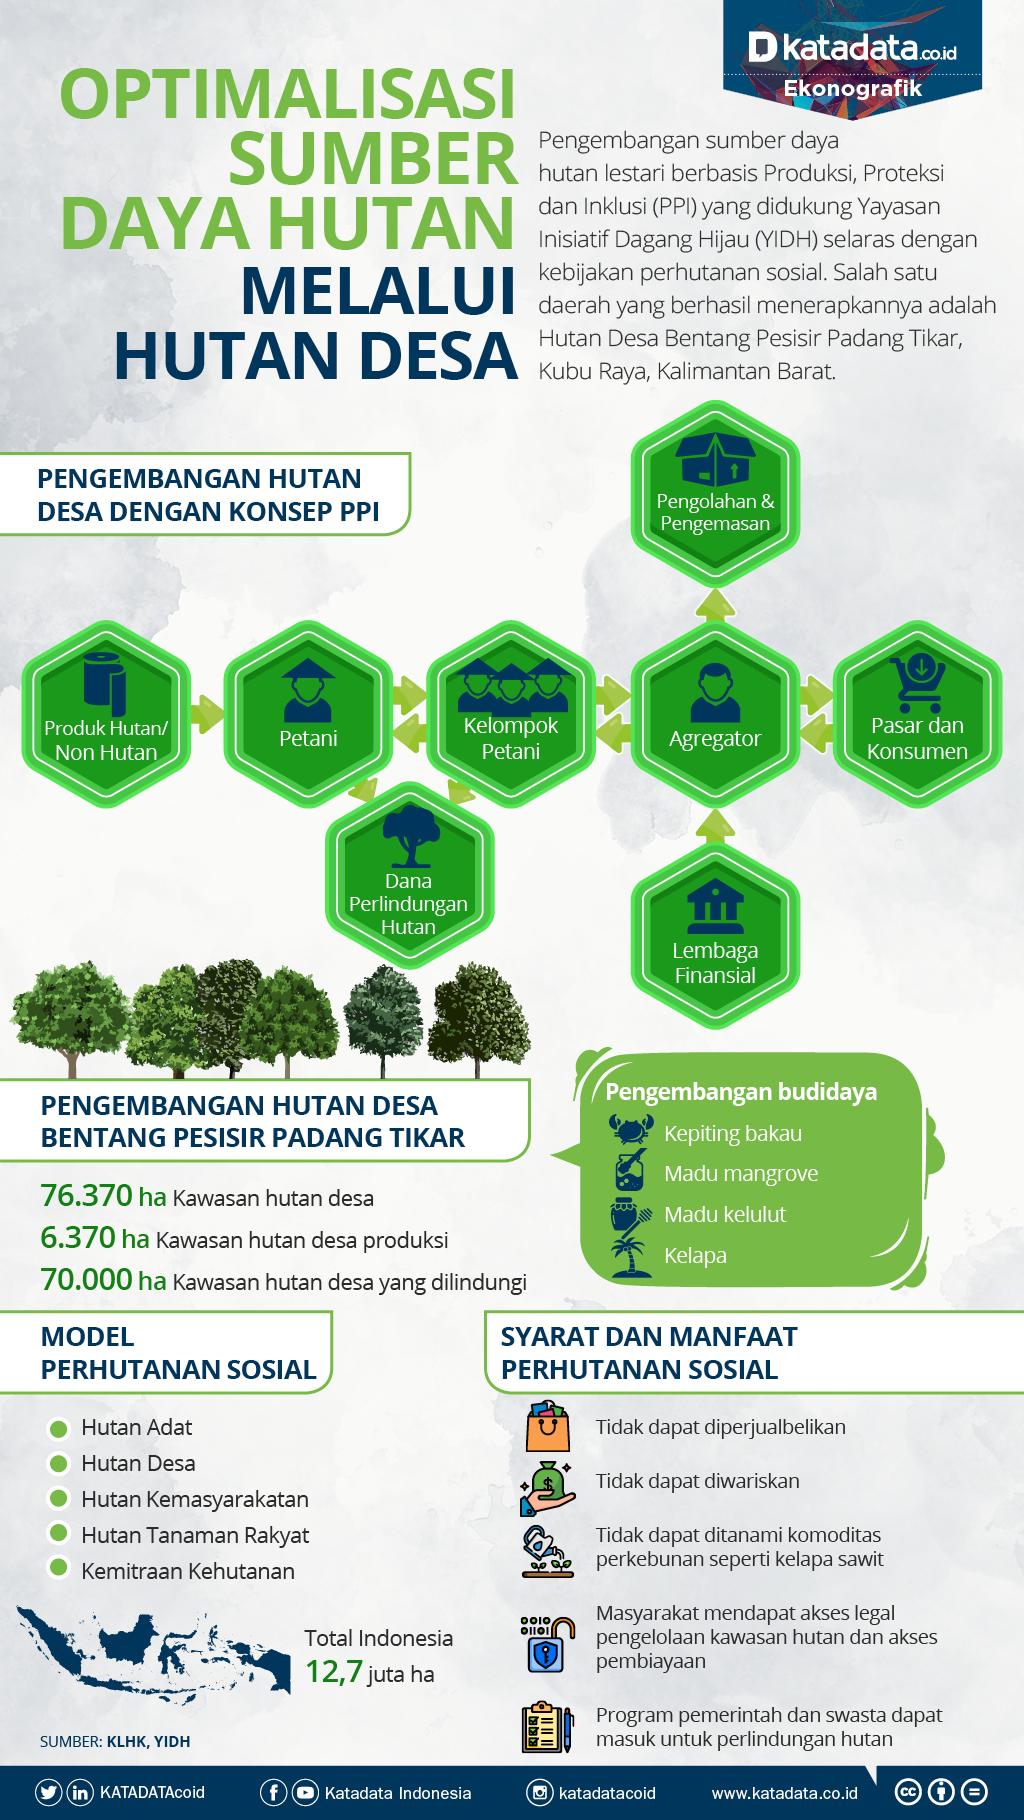 Optimalisasi Sumber Daya Hutan Melalui Hutan Desa